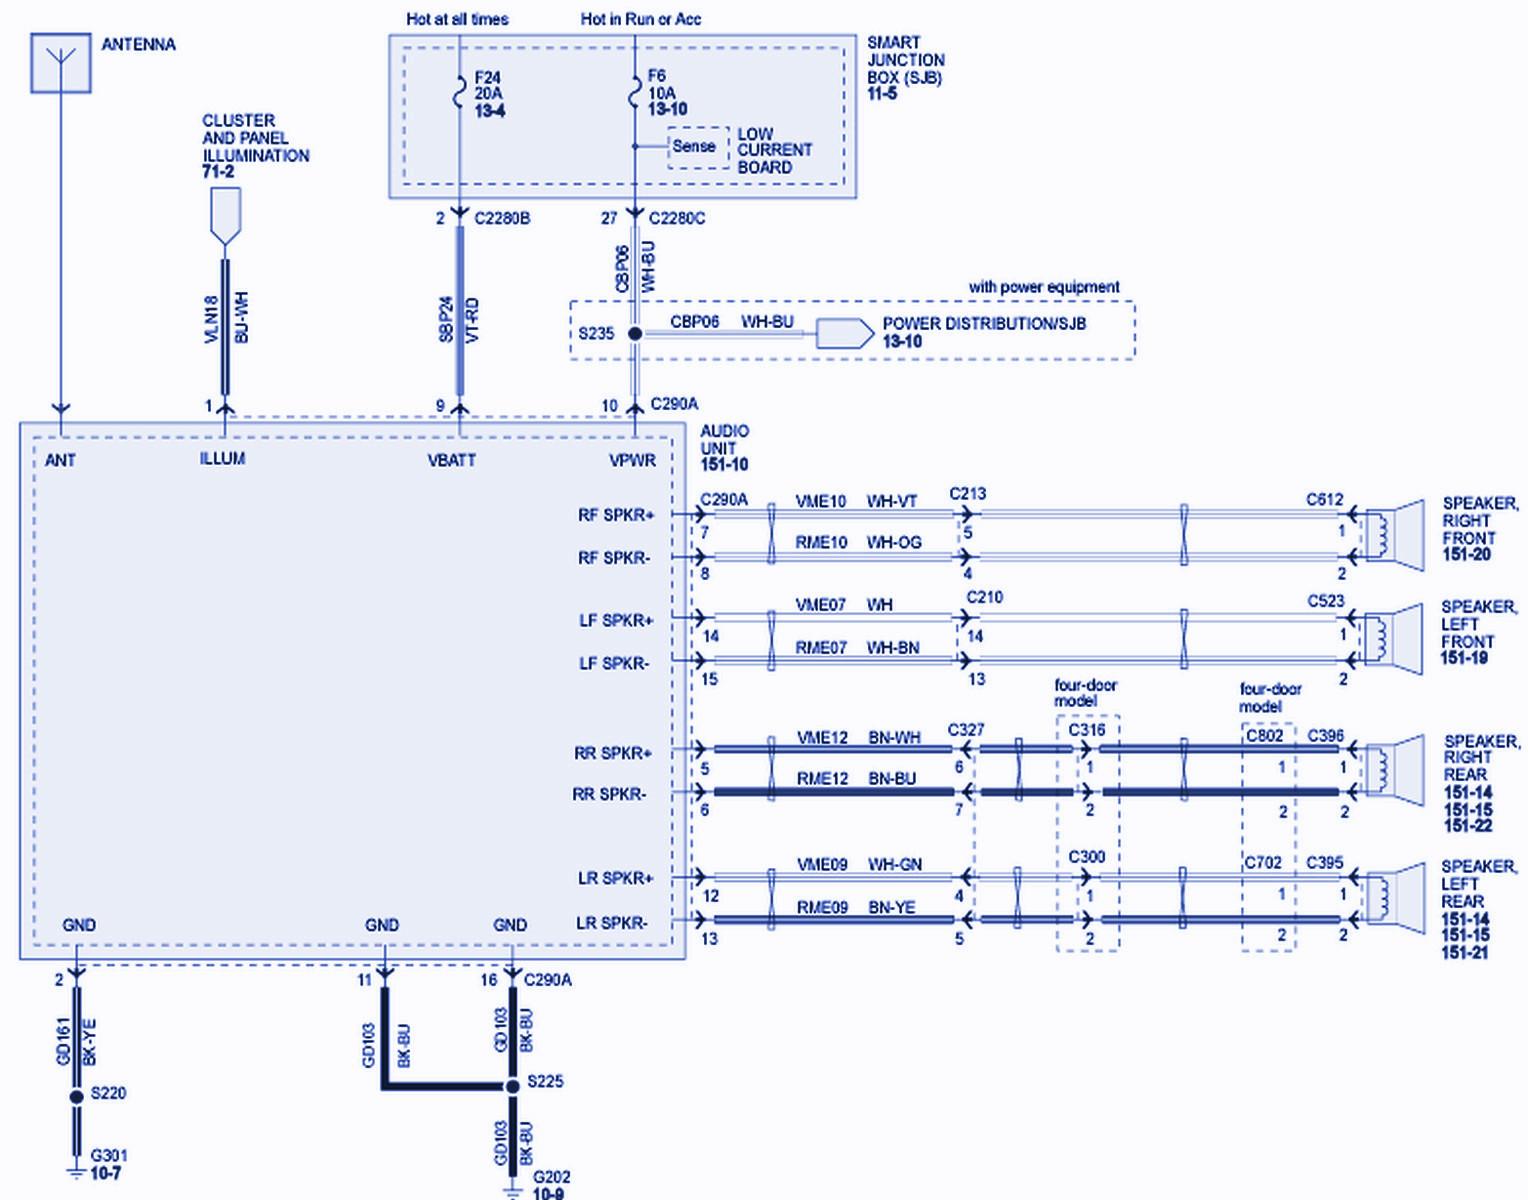 small resolution of 2010 f350 wiring diagram schema diagram database 2010 ford ranger wiring diagram 2010 f250 wiring diagram